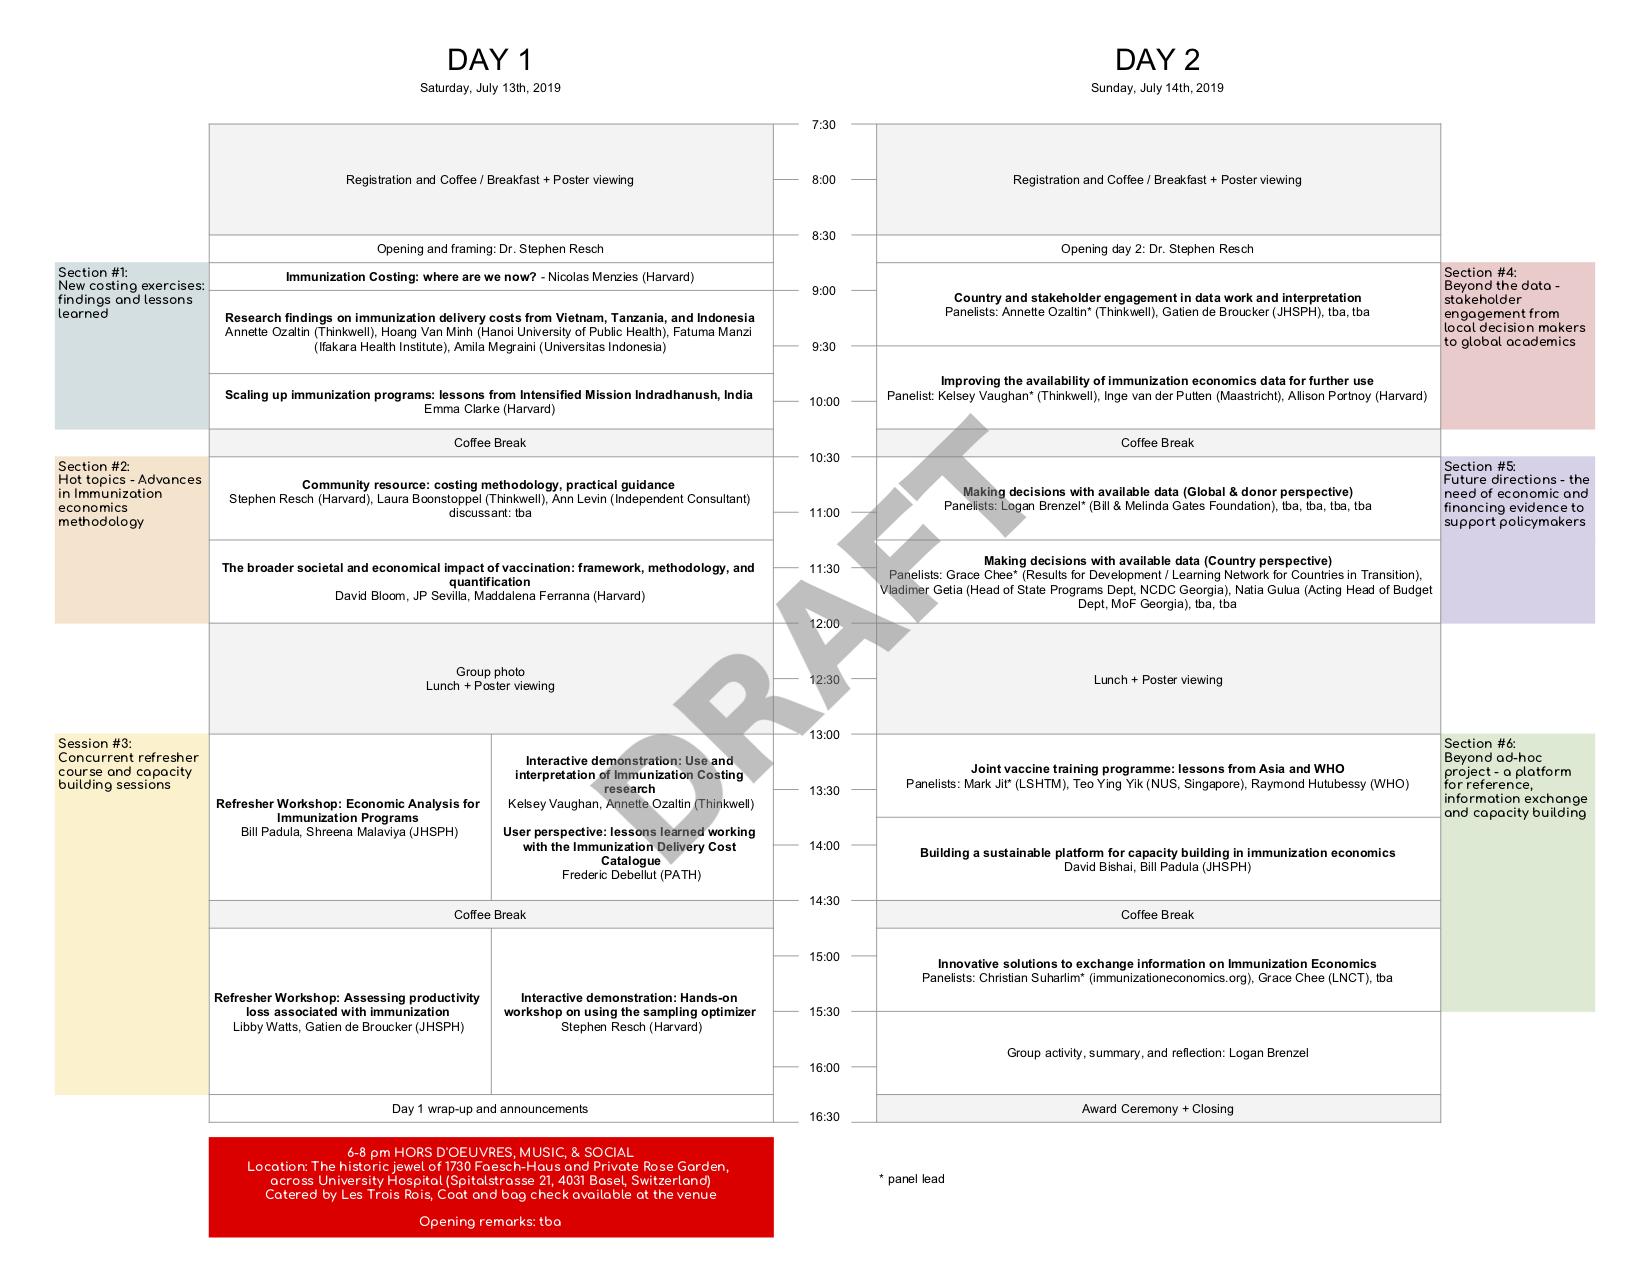 iHEA Basel pre-Congress, Immunization Economics - updated session agenda-6.jpg